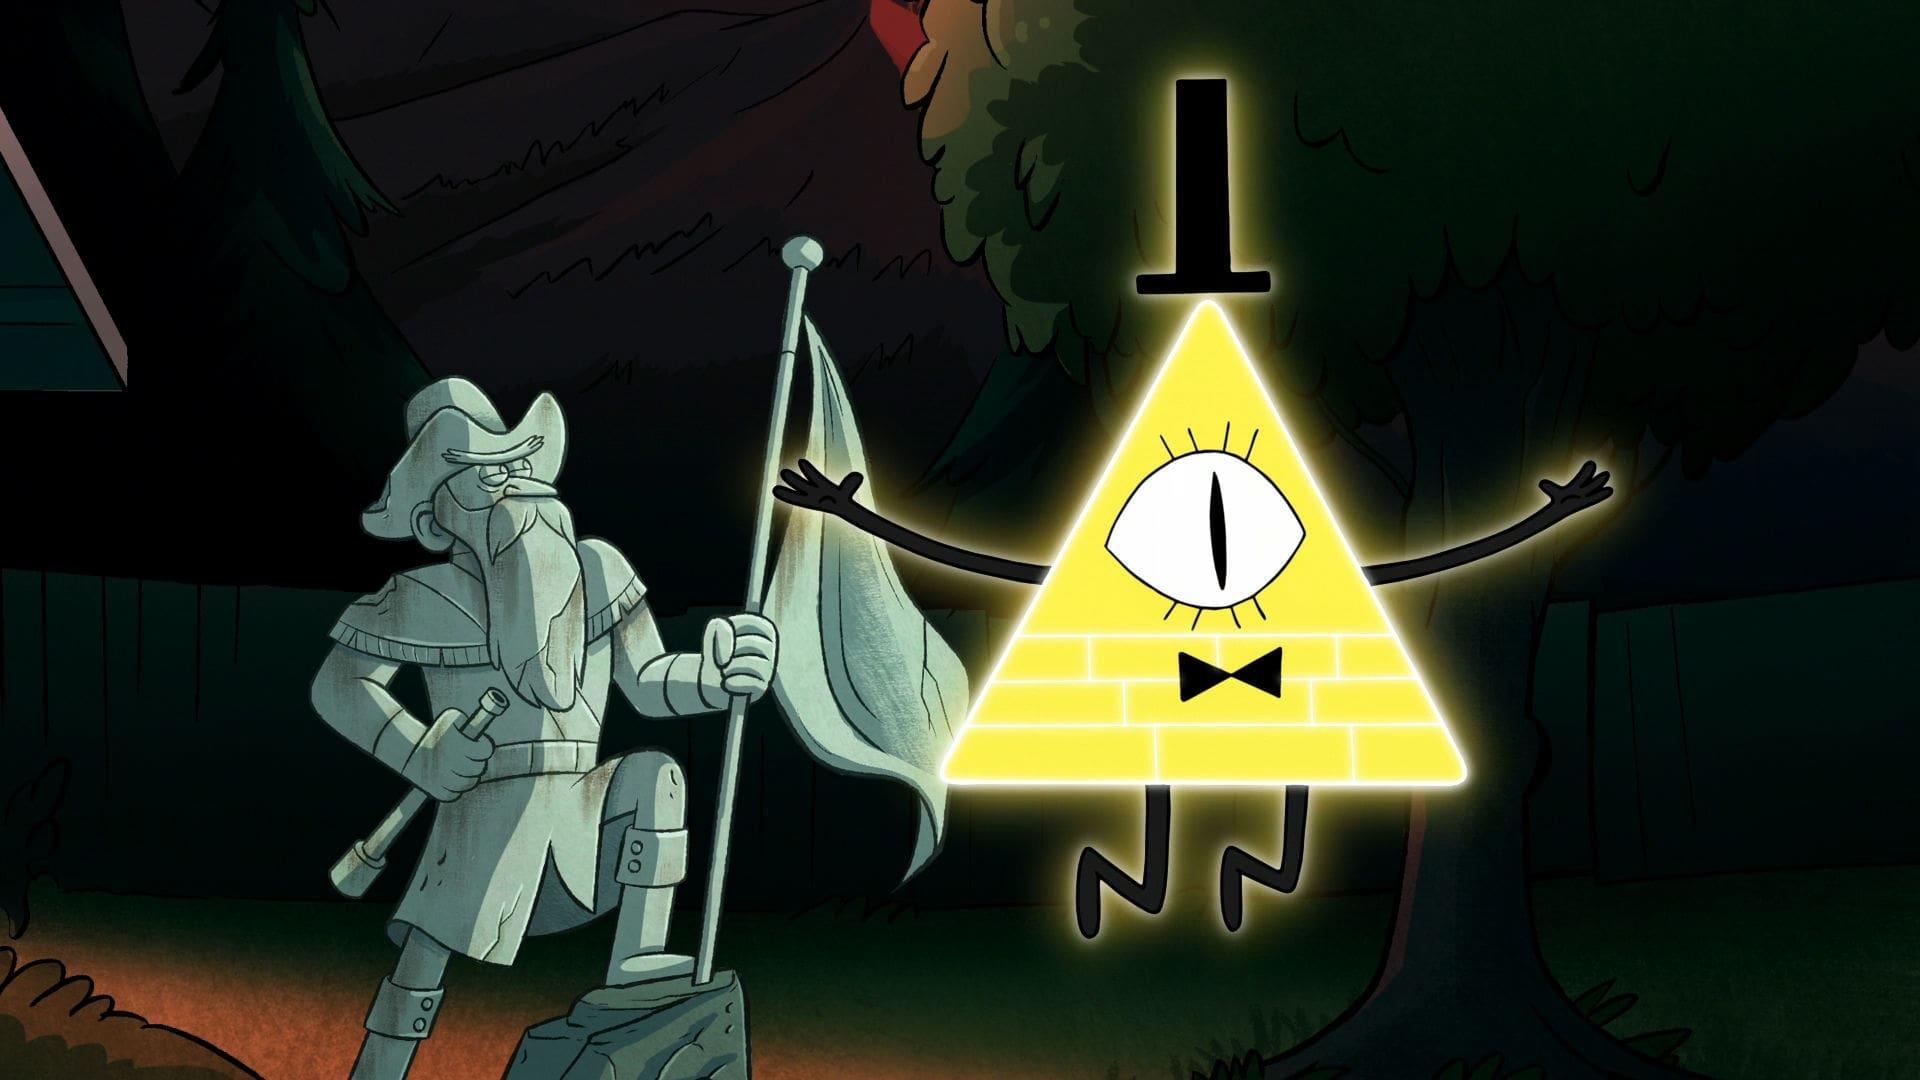 Gravity Falls Bill Cipher Wallpaper Souvenirs De Gravity Falls 2012 Saison 2 201 Pisode 18